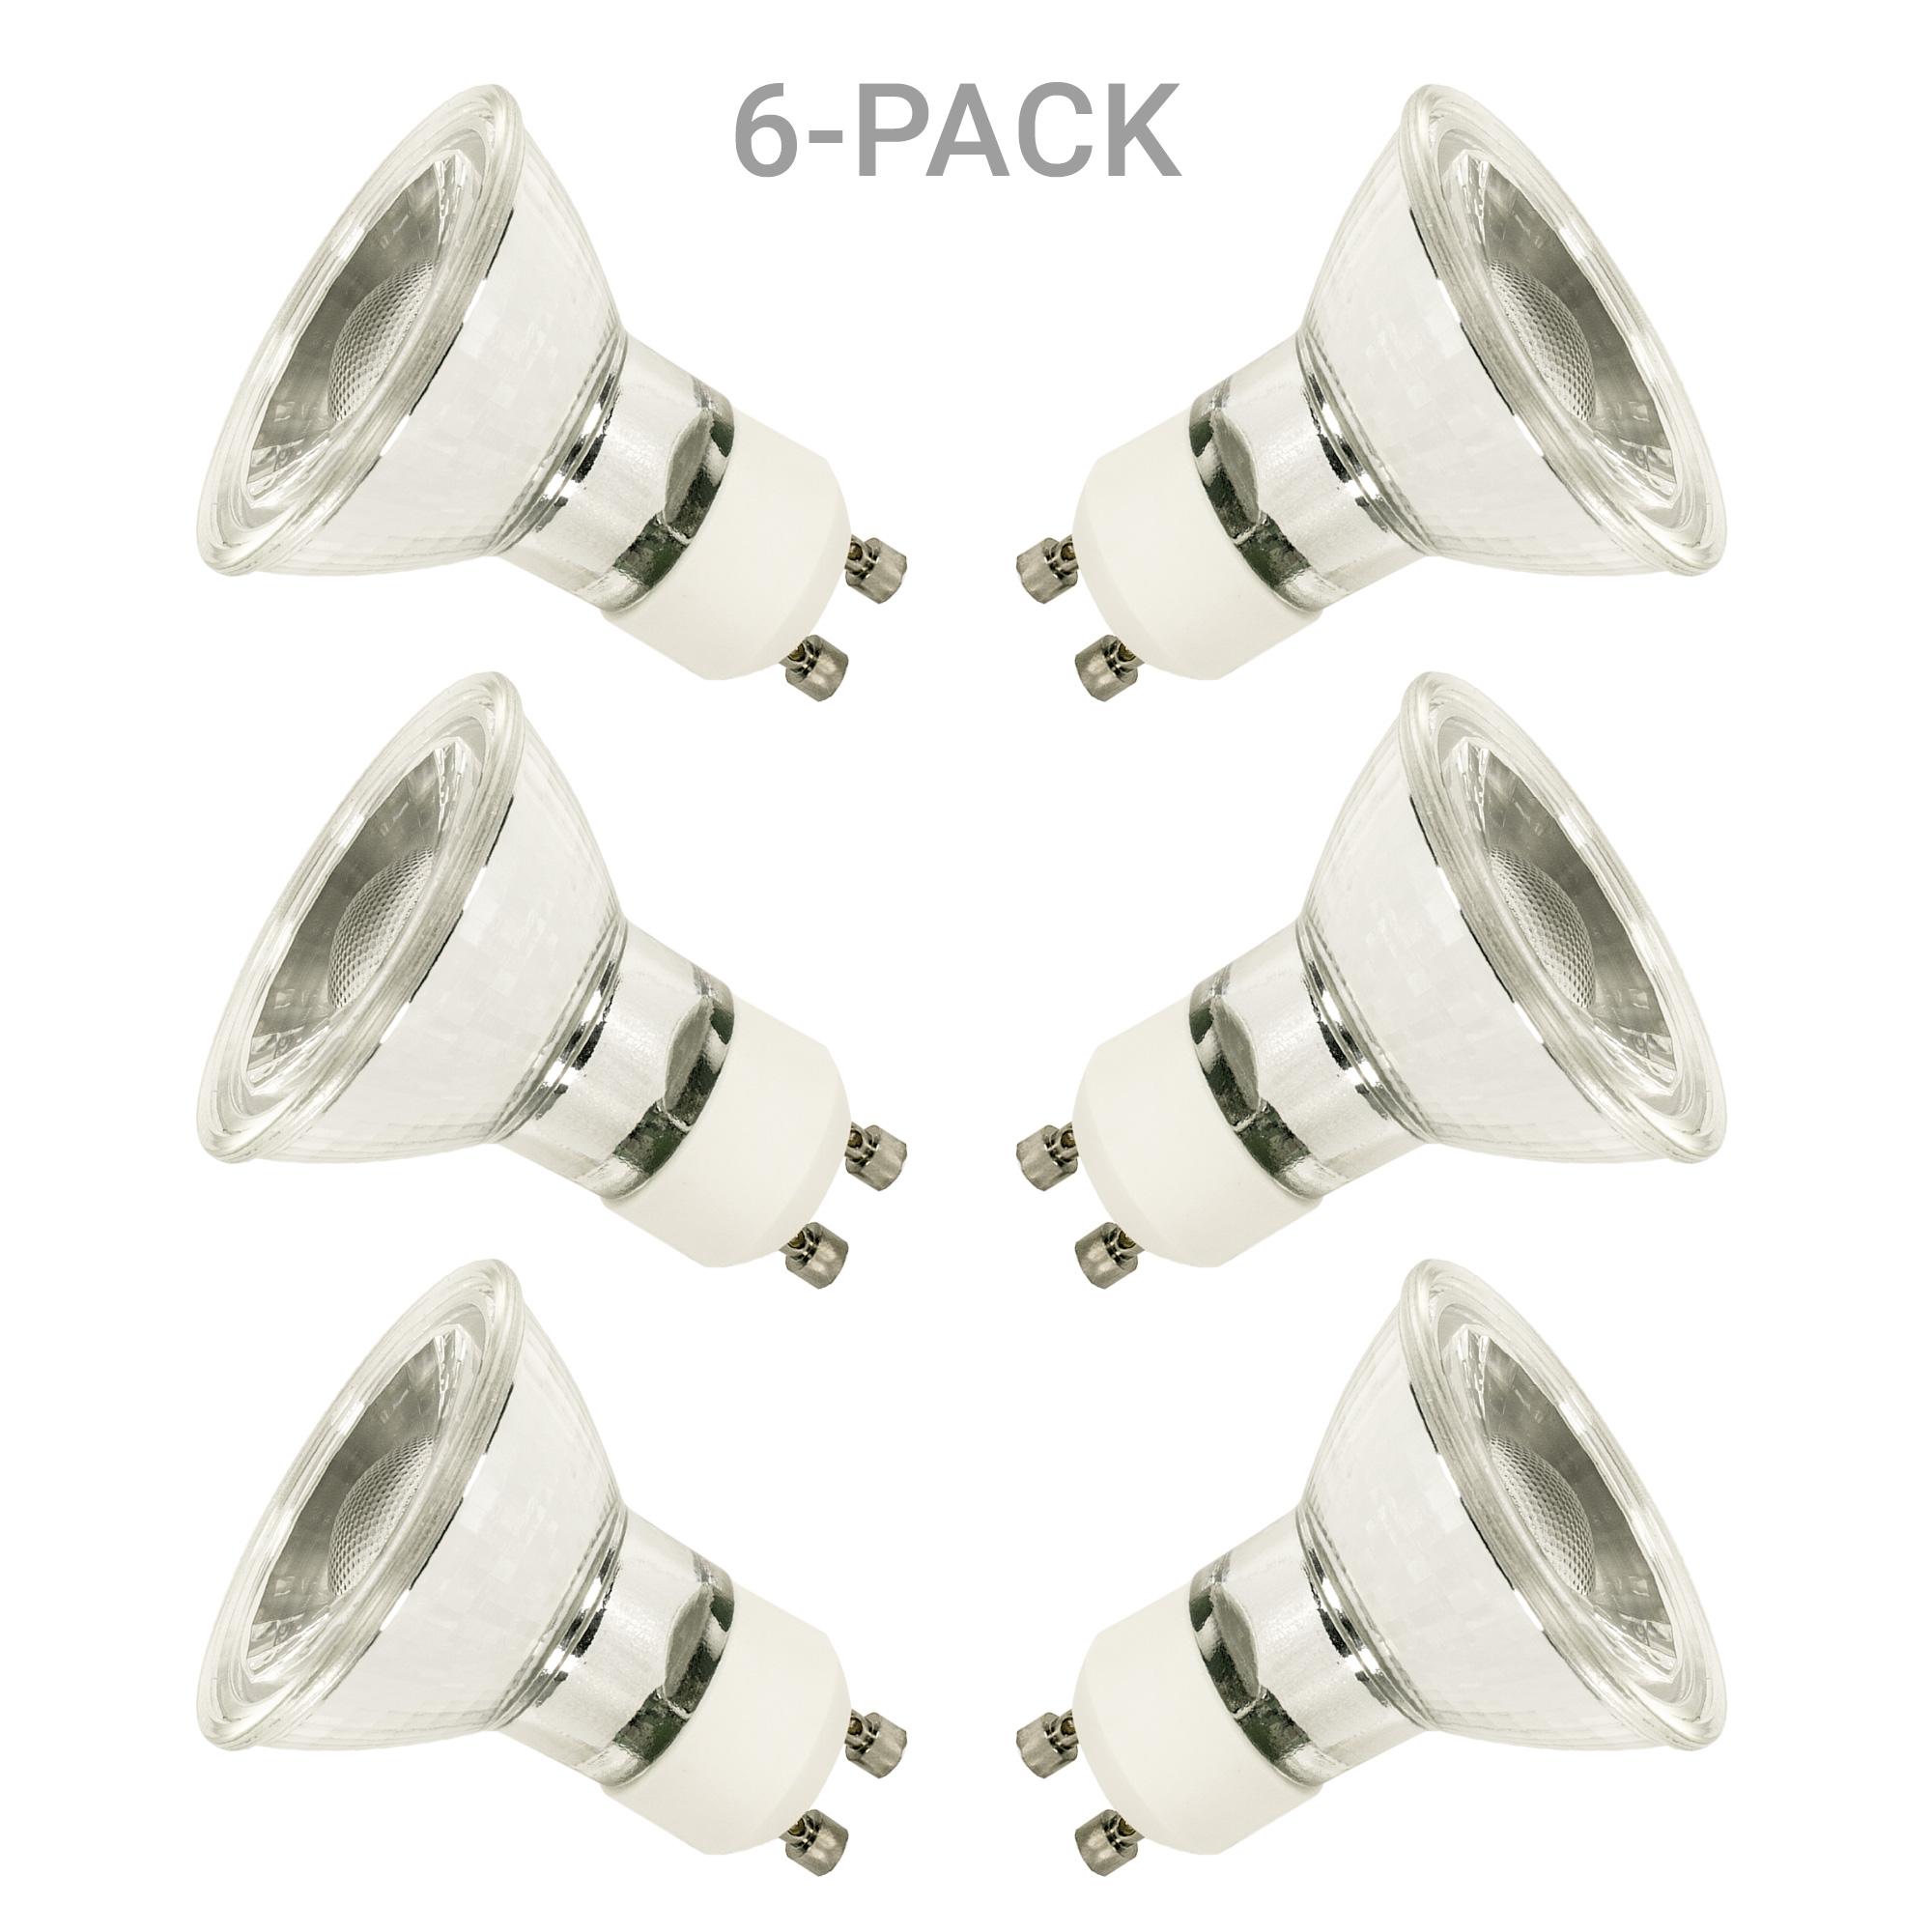 6-pack GU10 LED